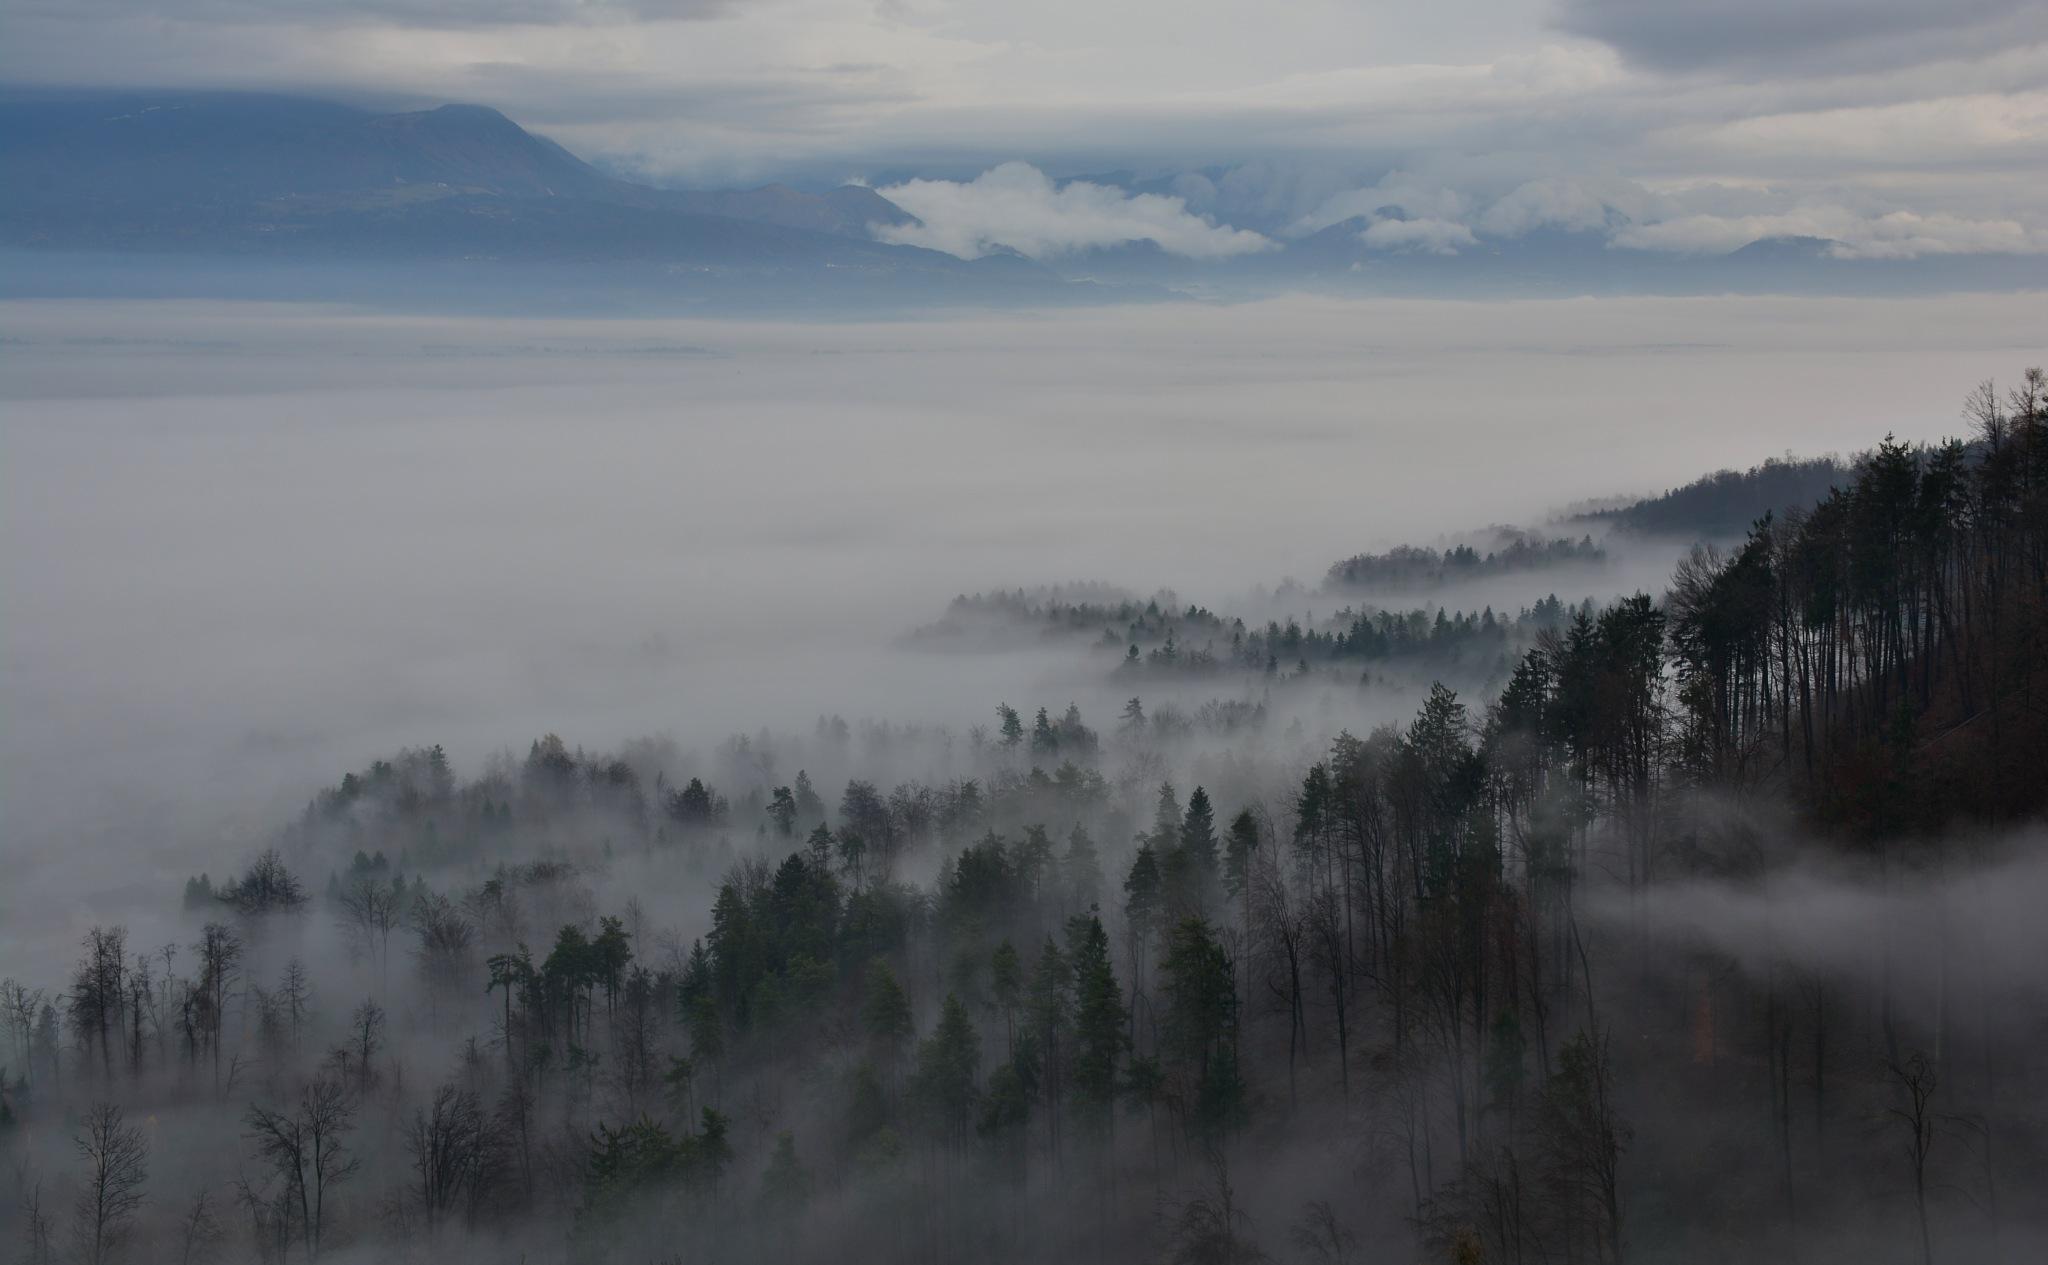 Foggy morning by Egon Cokan